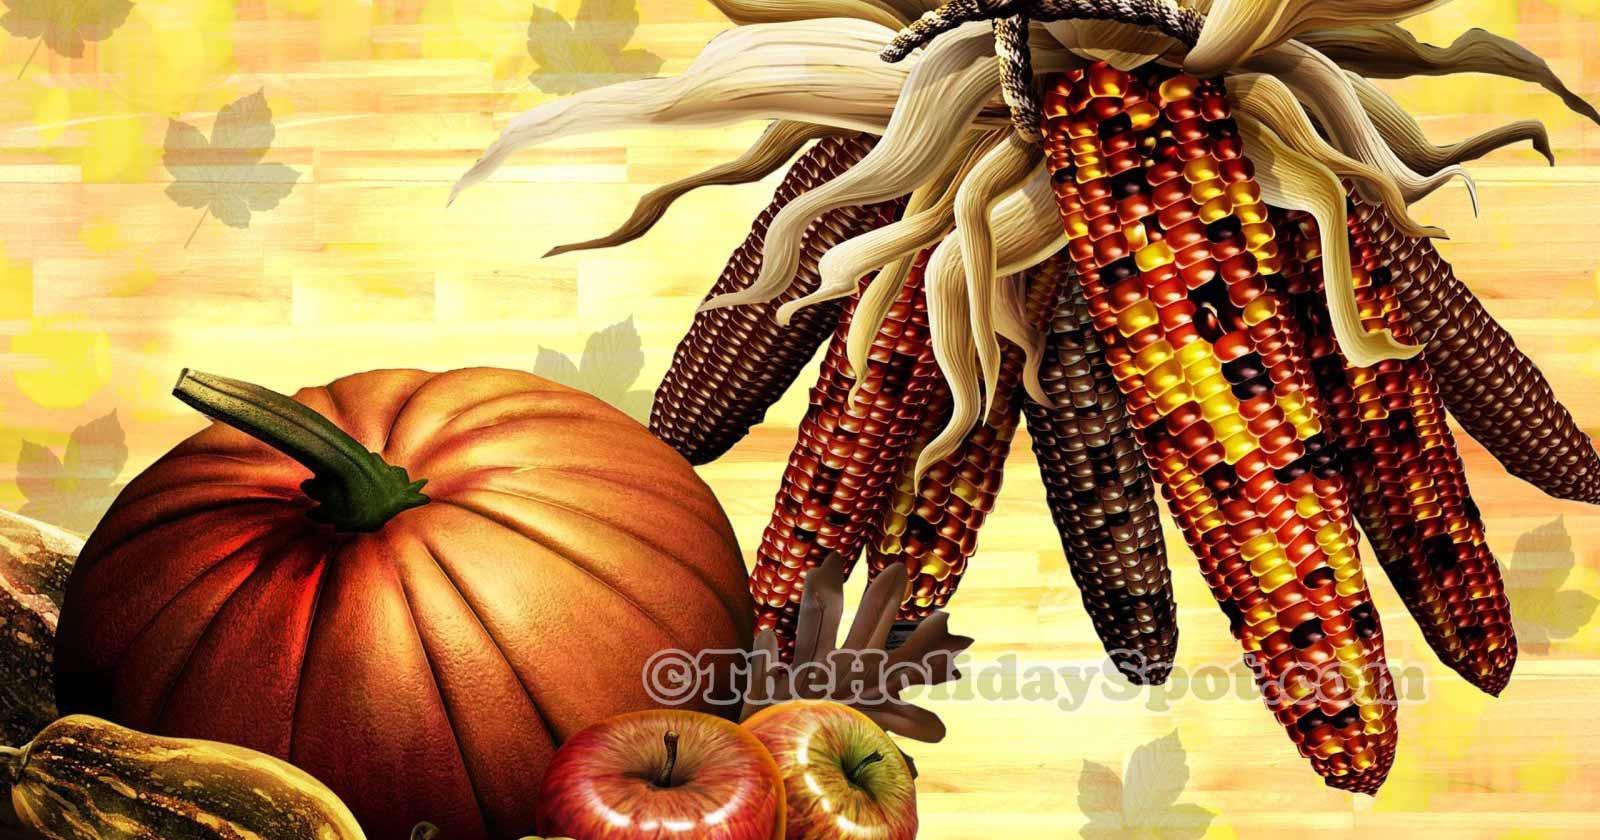 Free Fall Pumpkin Desktop Wallpaper Theholidayspot Holidays And Festivals Celebrations